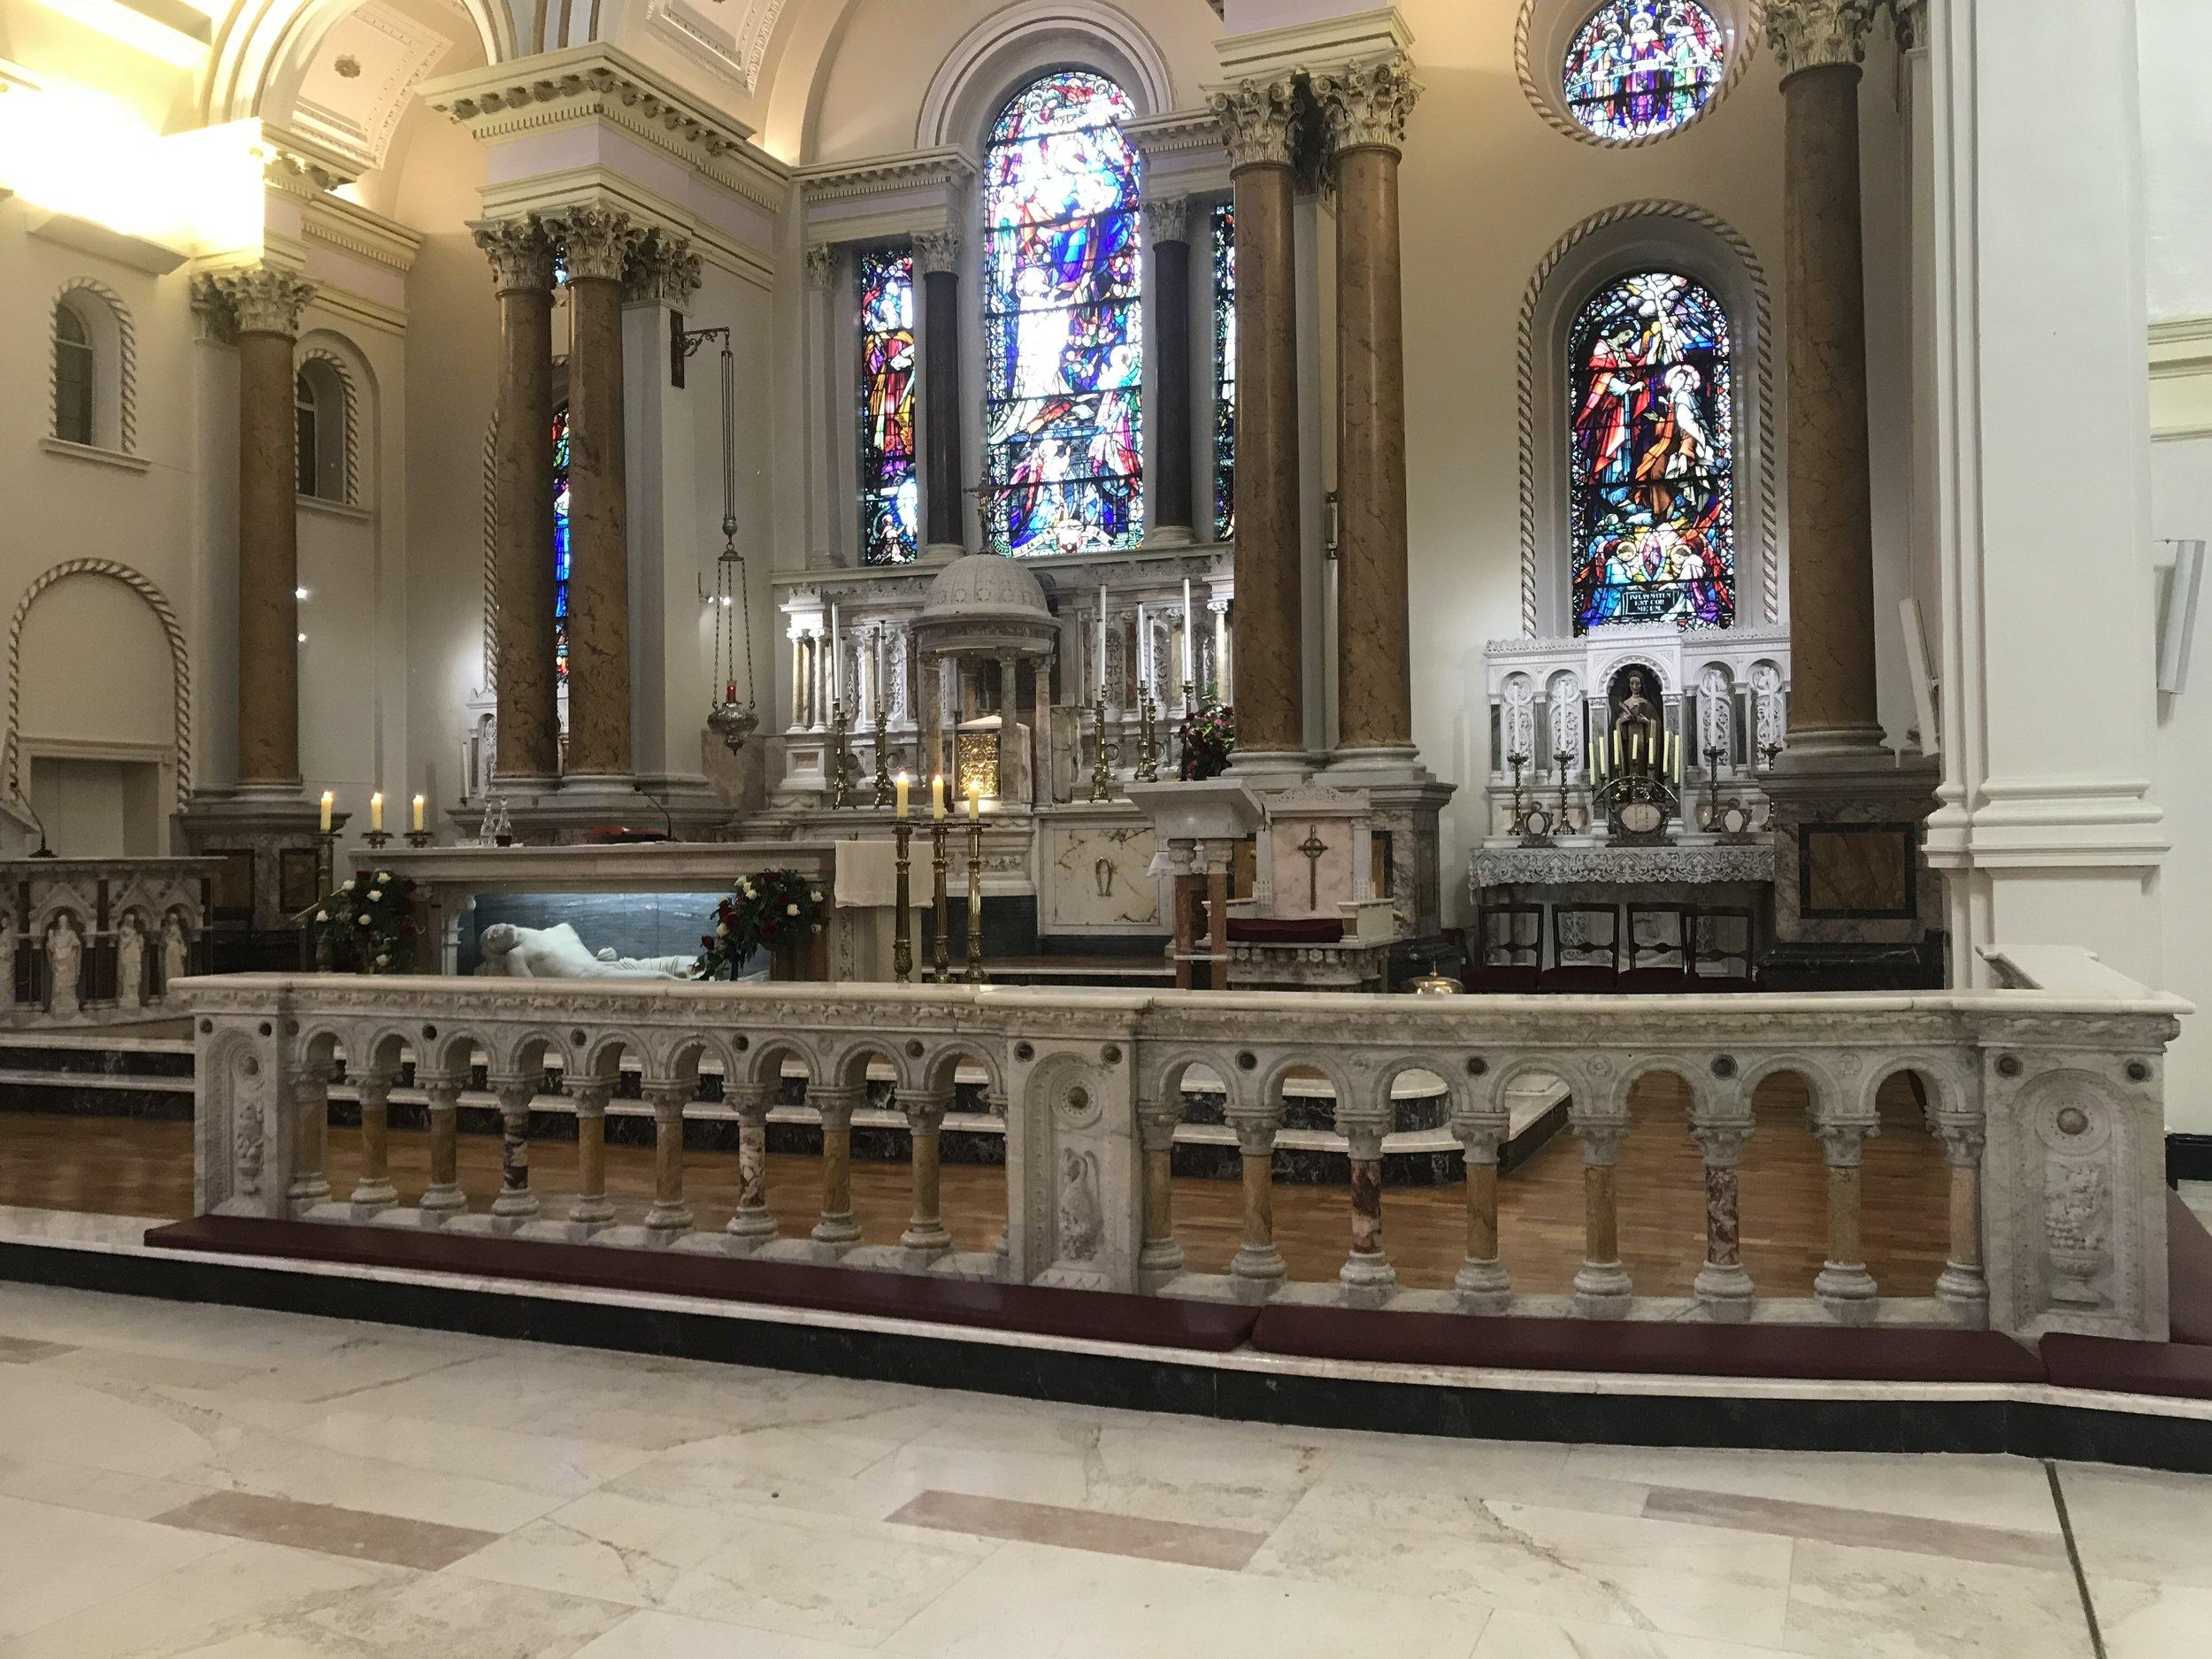 St. Theresa's Carmelite Church, Dublin